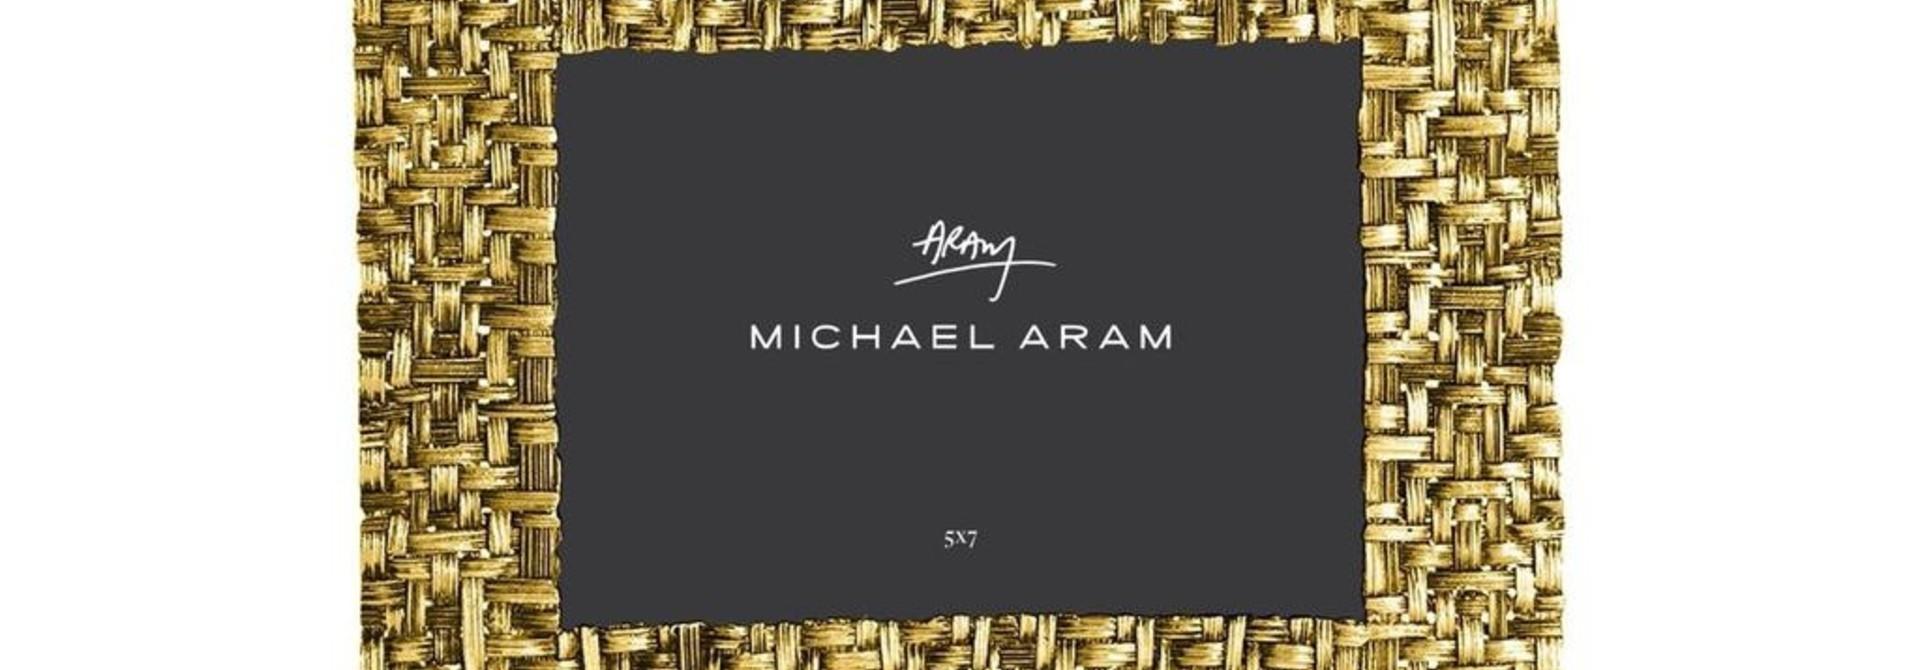 MICHAEL ARAM - Photo Frame Palm 13x18cm